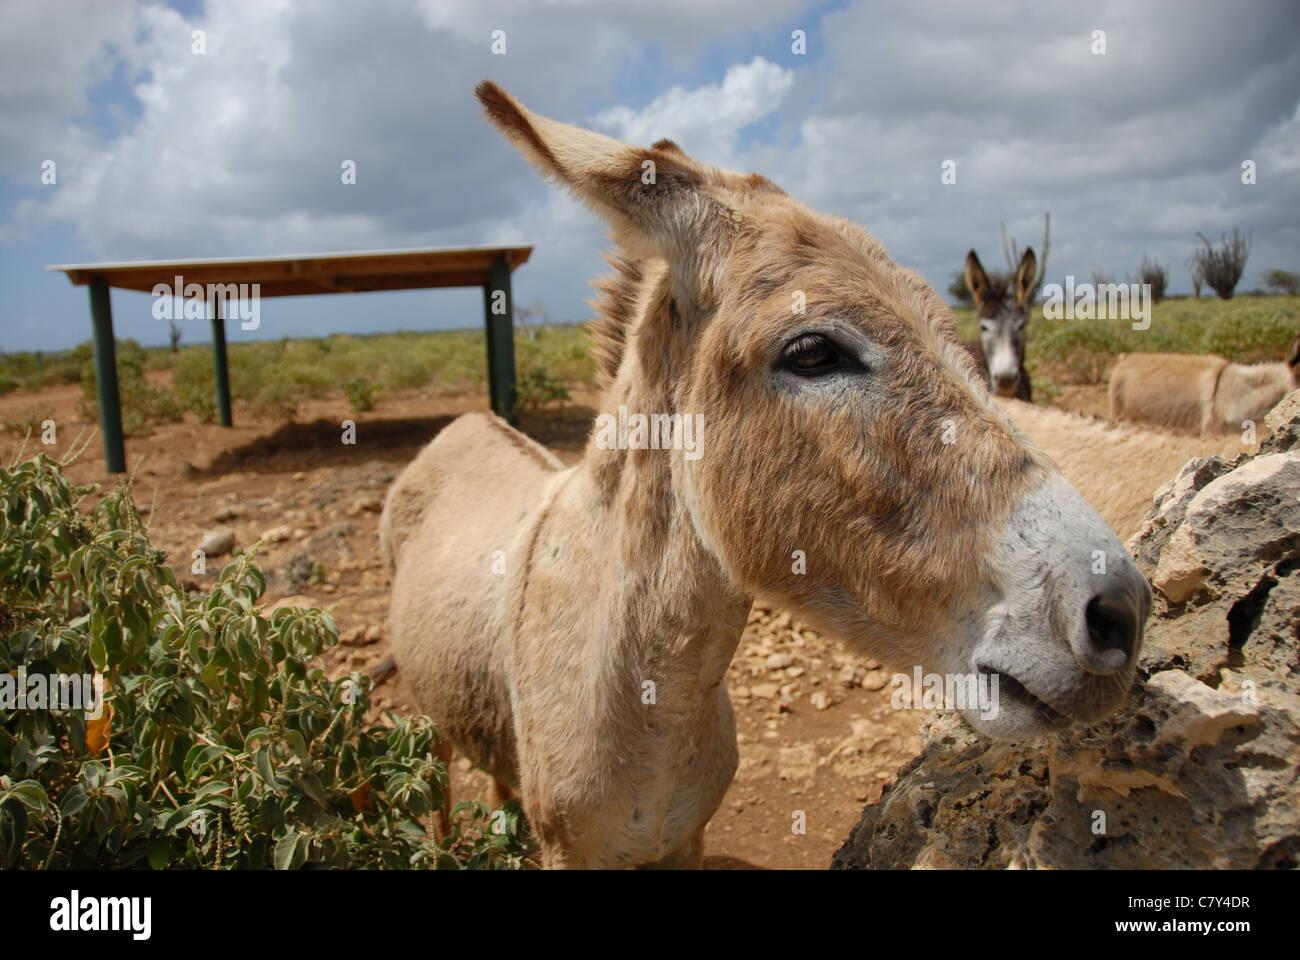 donkeys at the Donkey Sanctuary, Bonaire, Dutch Antilles Stock Photo